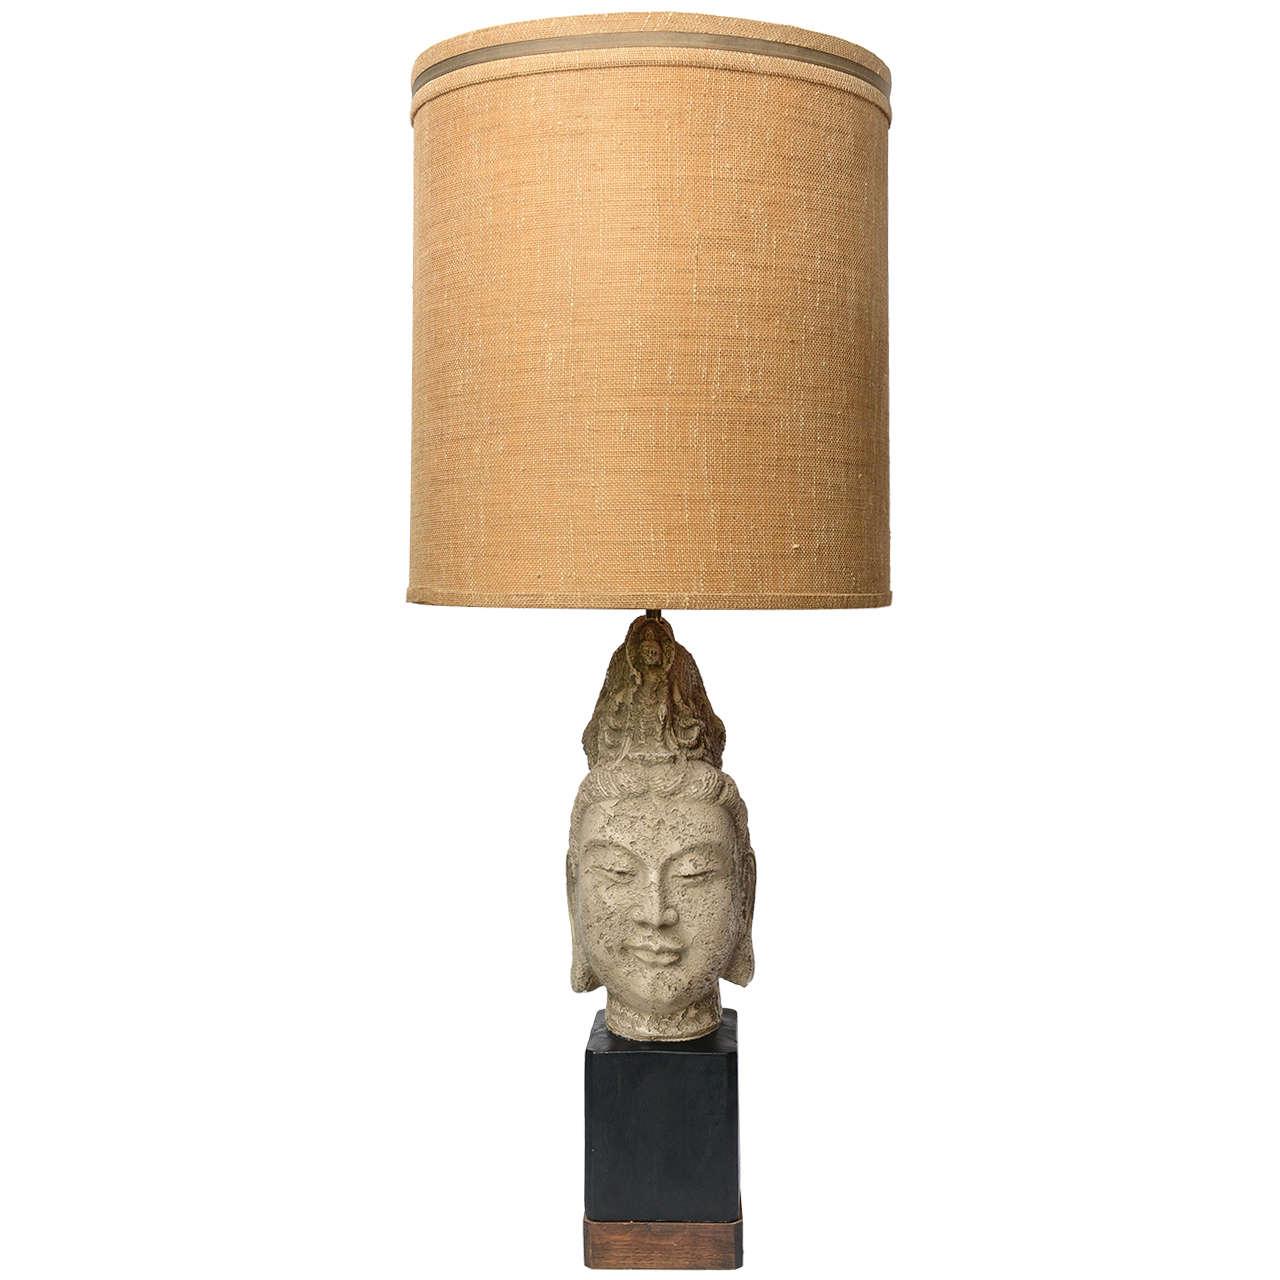 James Mont Buddha Table Lamp